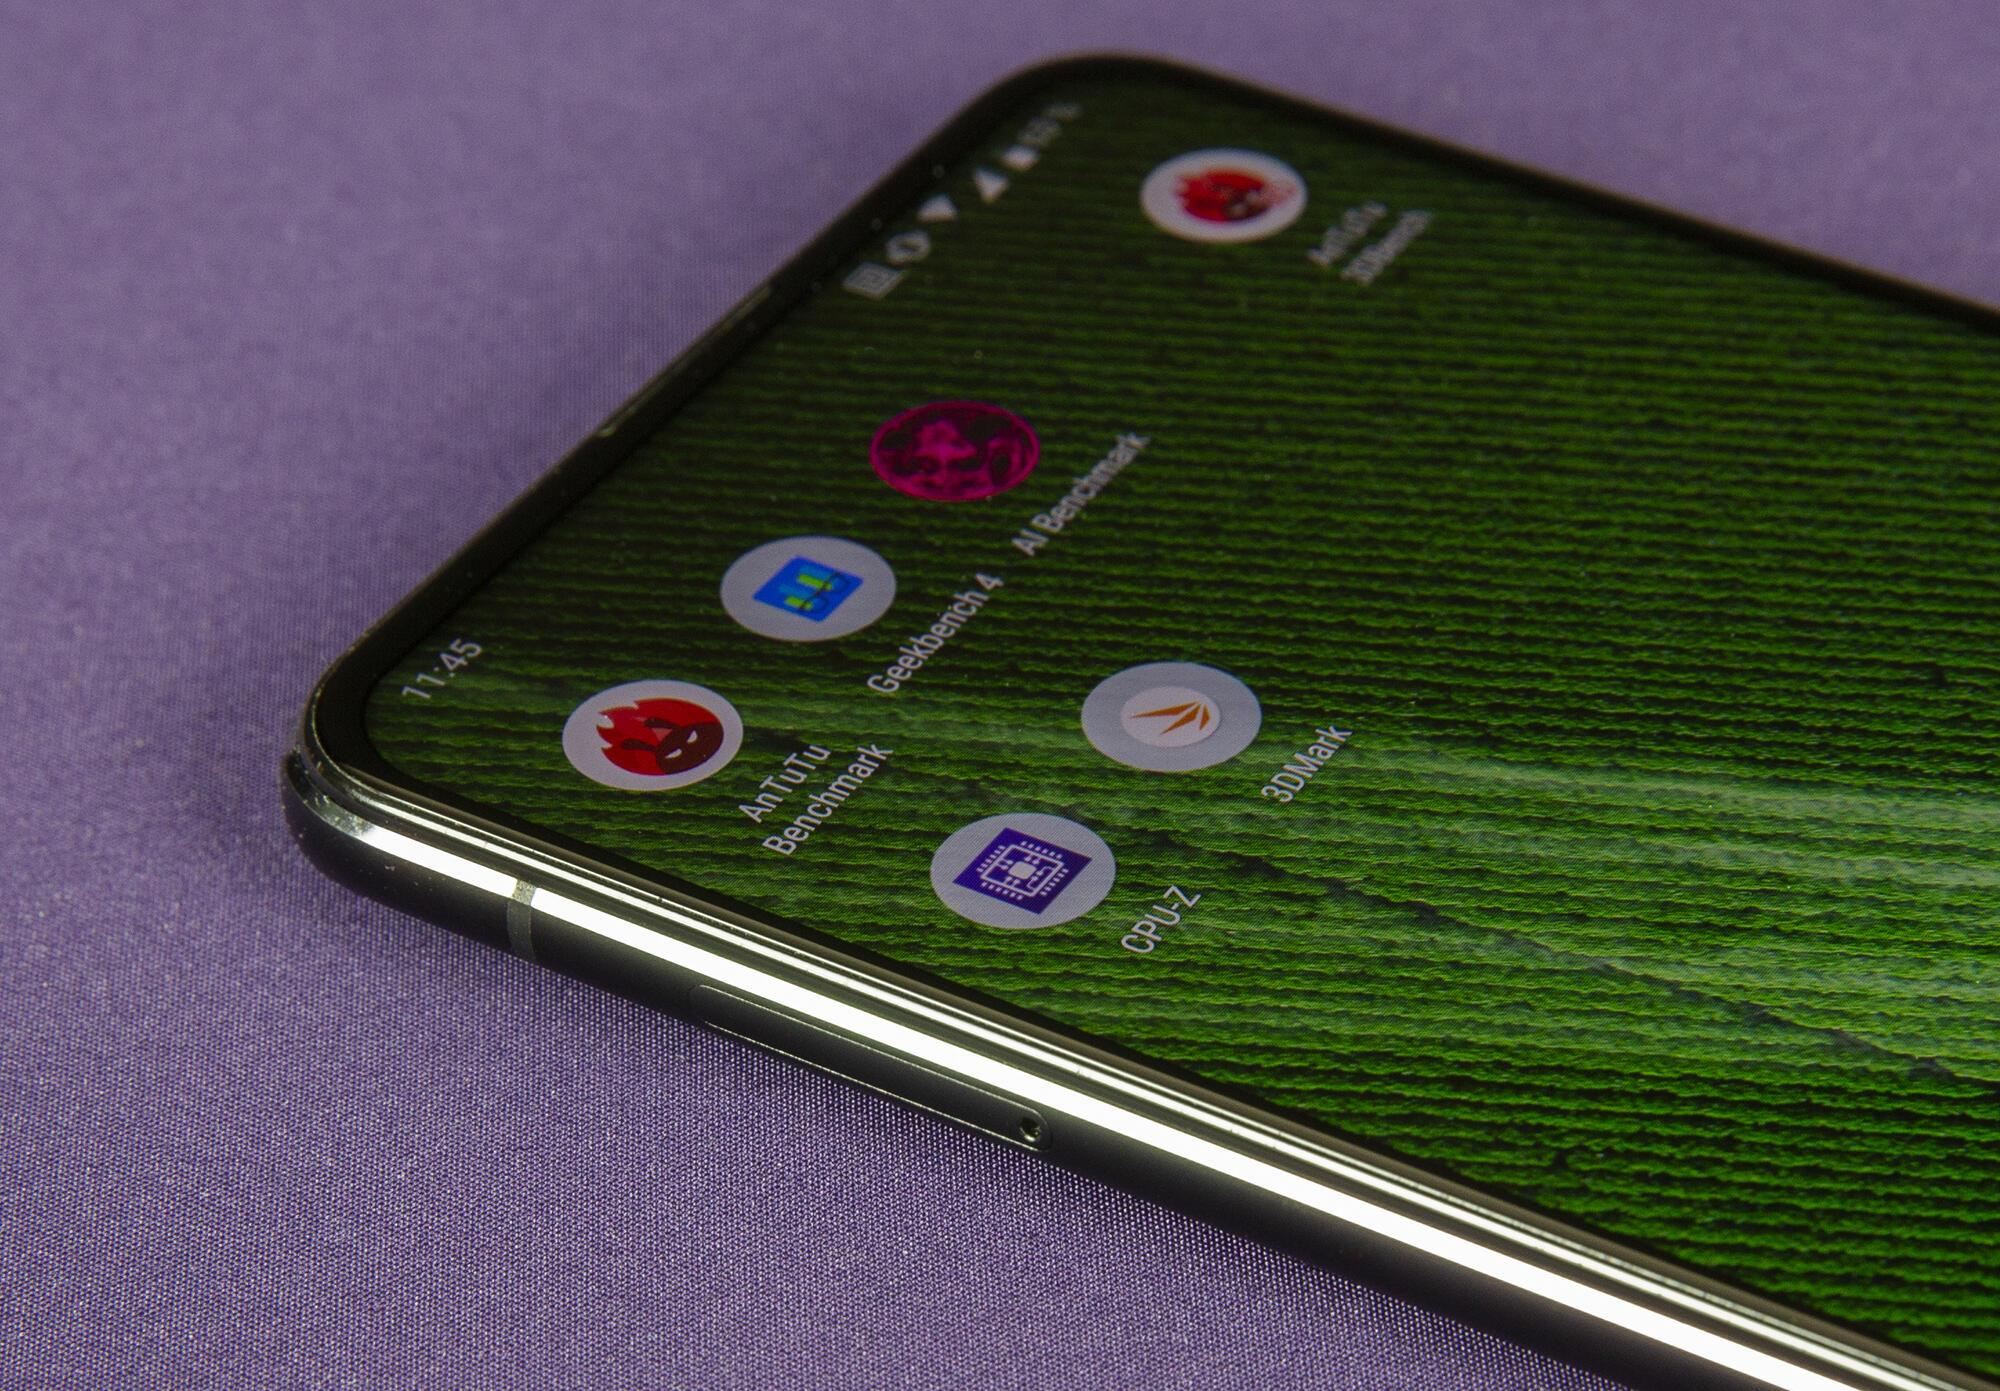 Smartfony i aksessuary - Obzor smartfona ASUS ZenFone 6